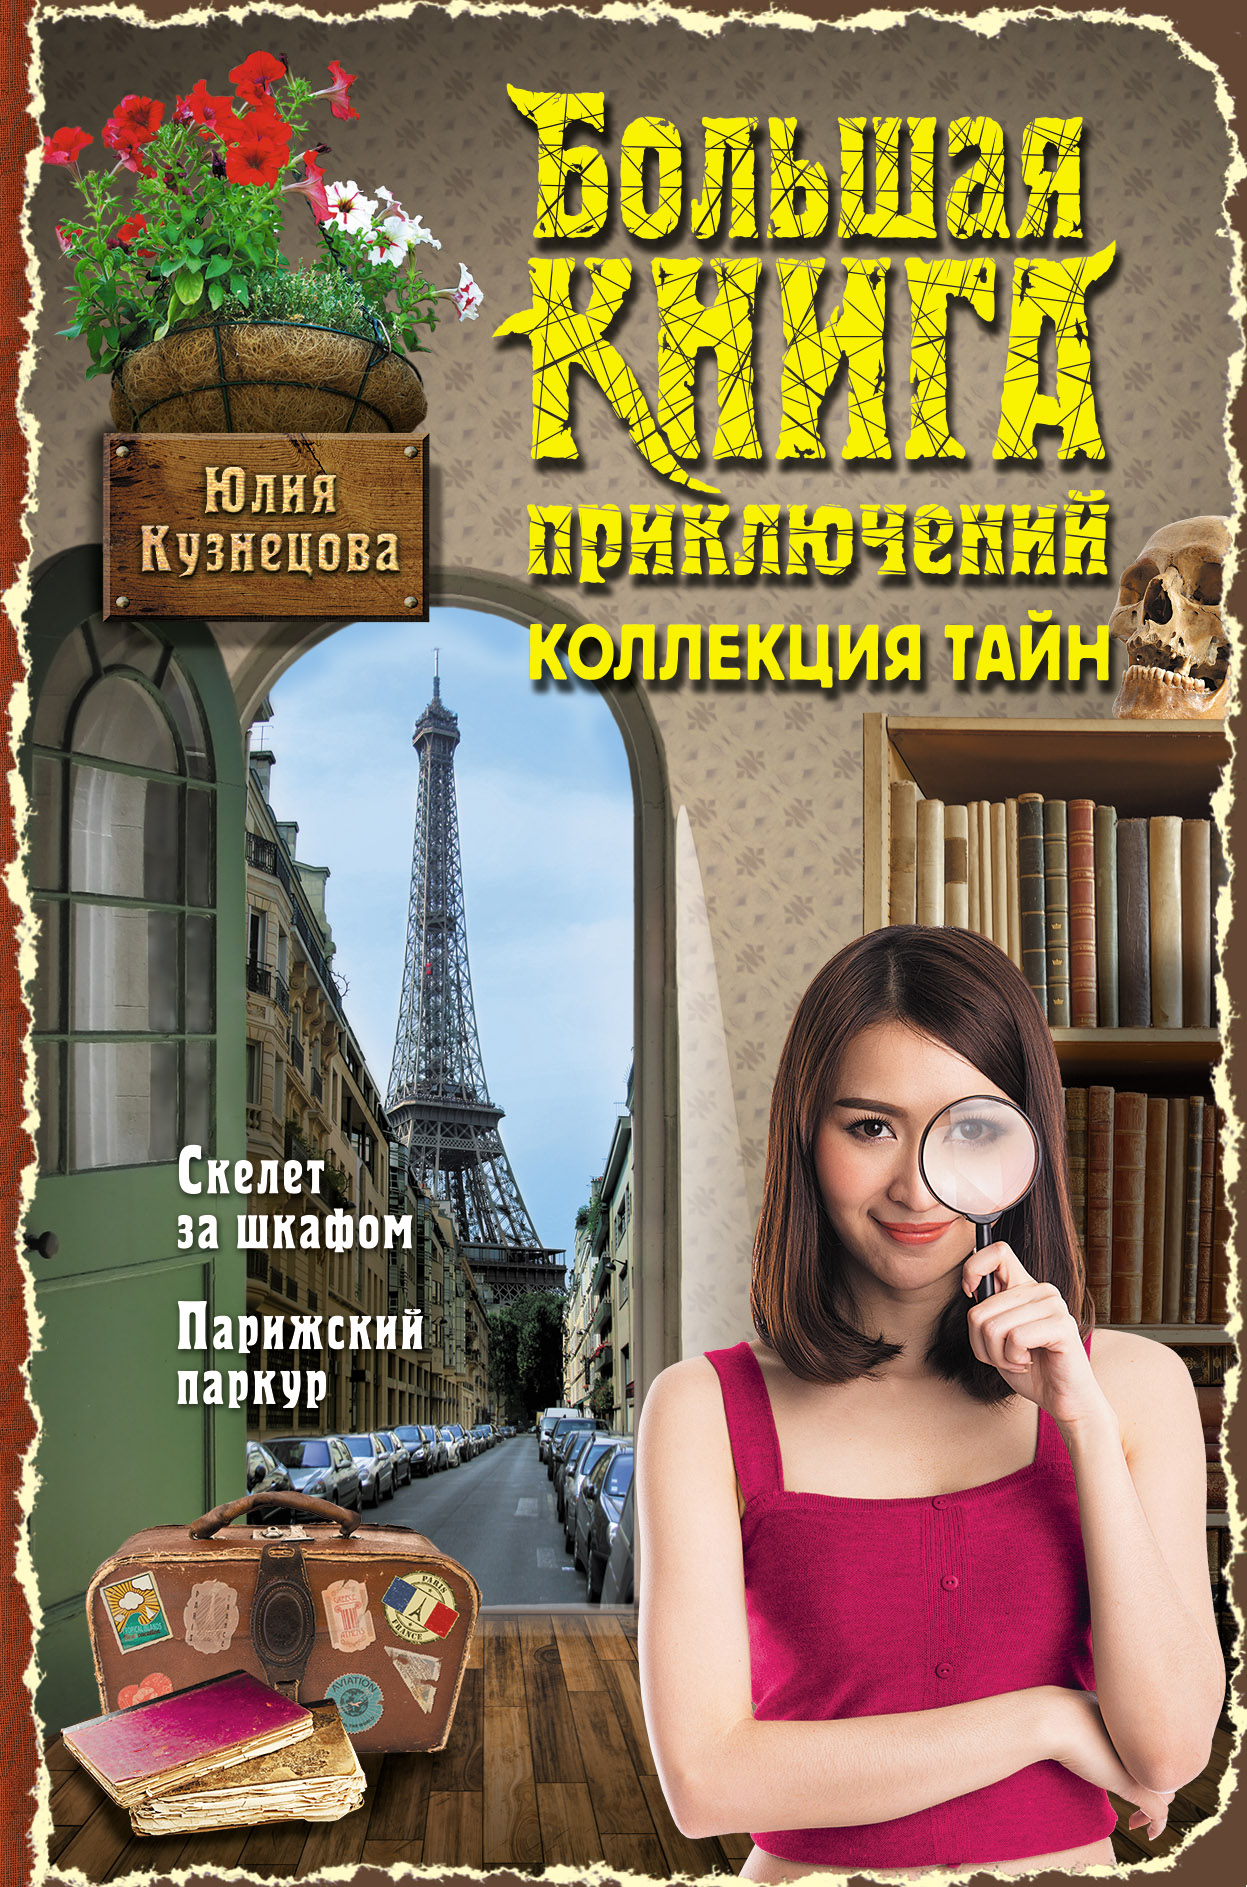 Кузнецова Ю.. Большая книга приключений. Коллекция тайн